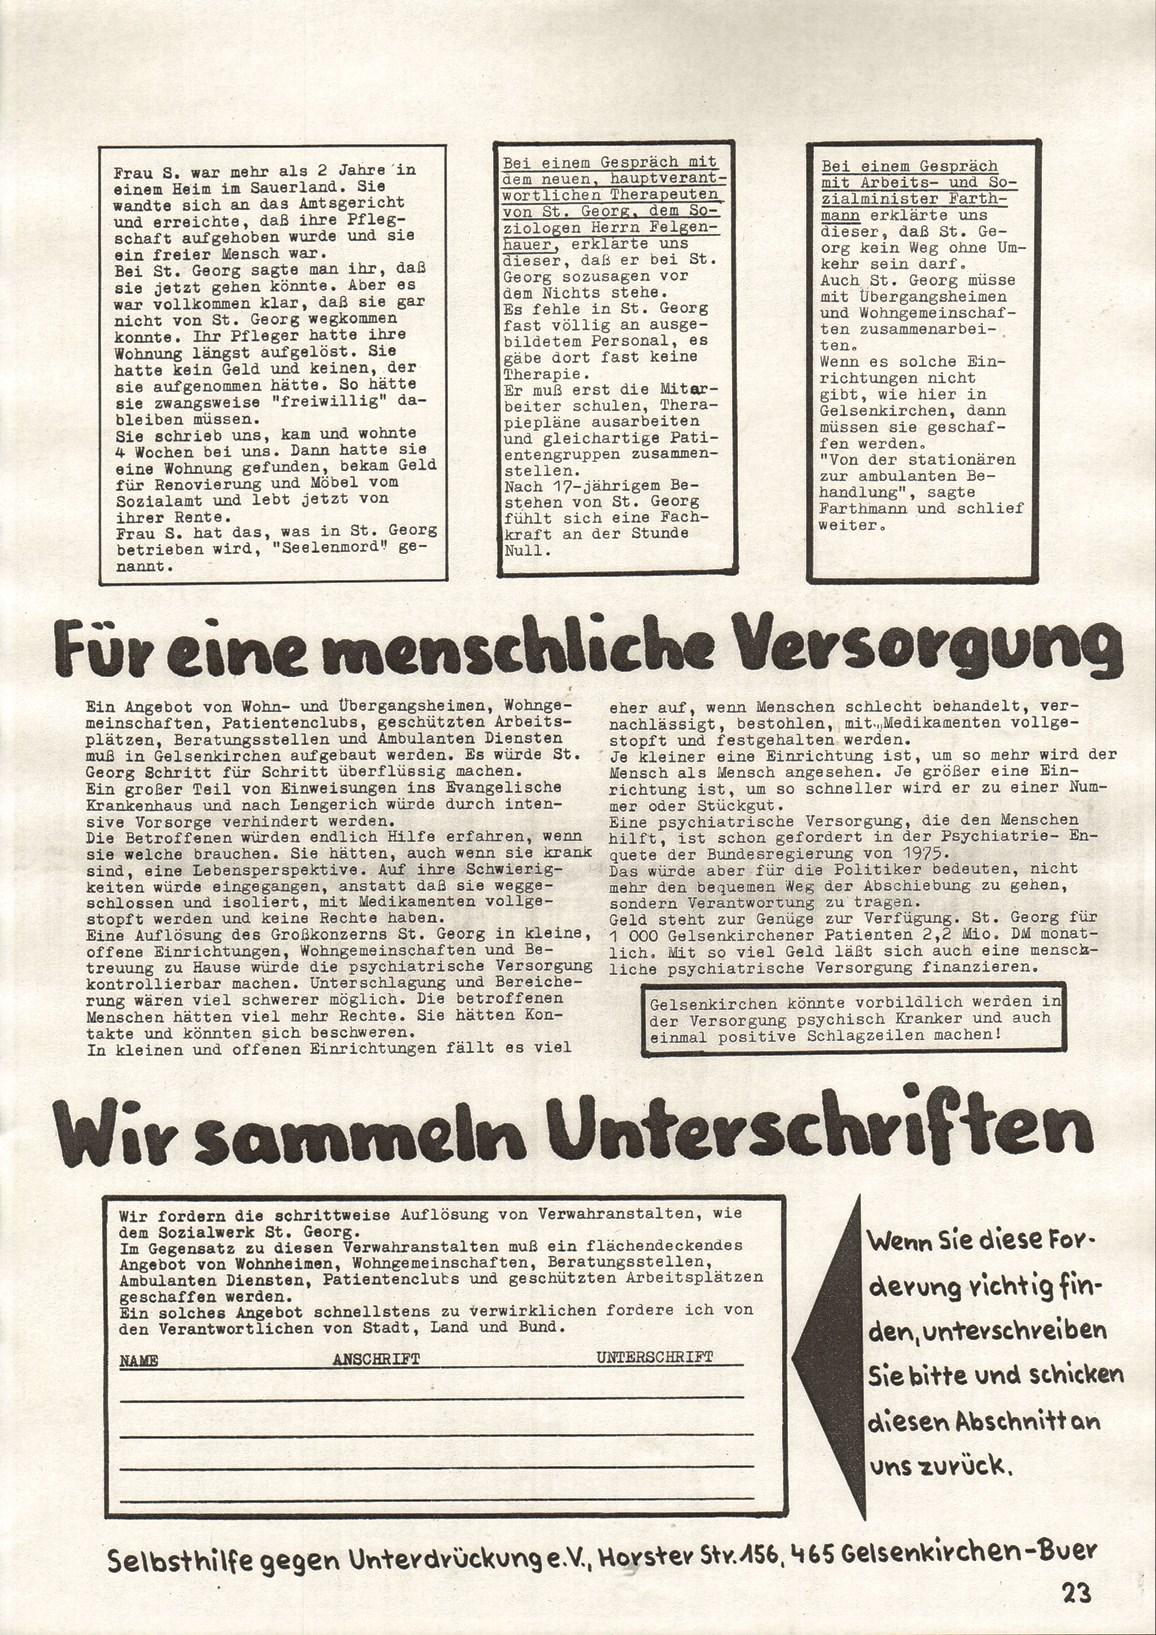 Gelsenkirchen_Selbsthilfe_Blatt_1983_02_23